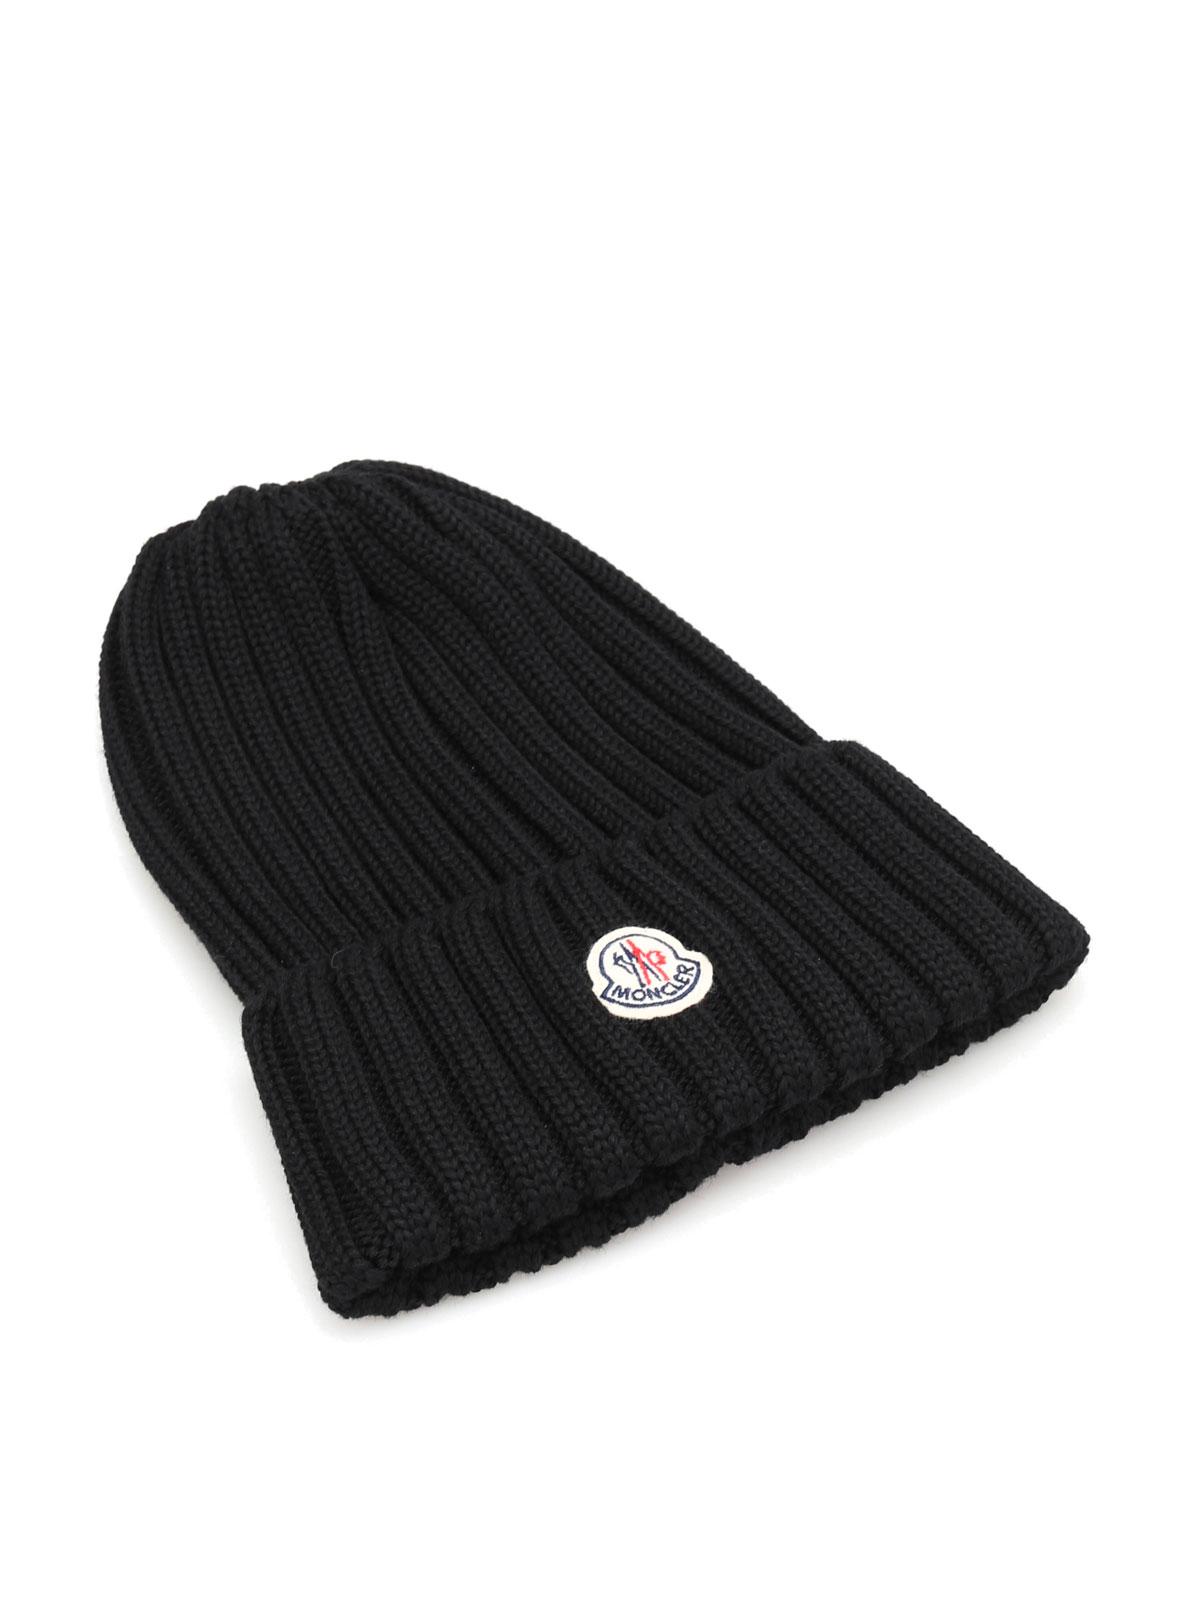 eba0b63bab5 Moncler - Knit virgin wool beanie - beanies - B2 093 0022000 03510 999